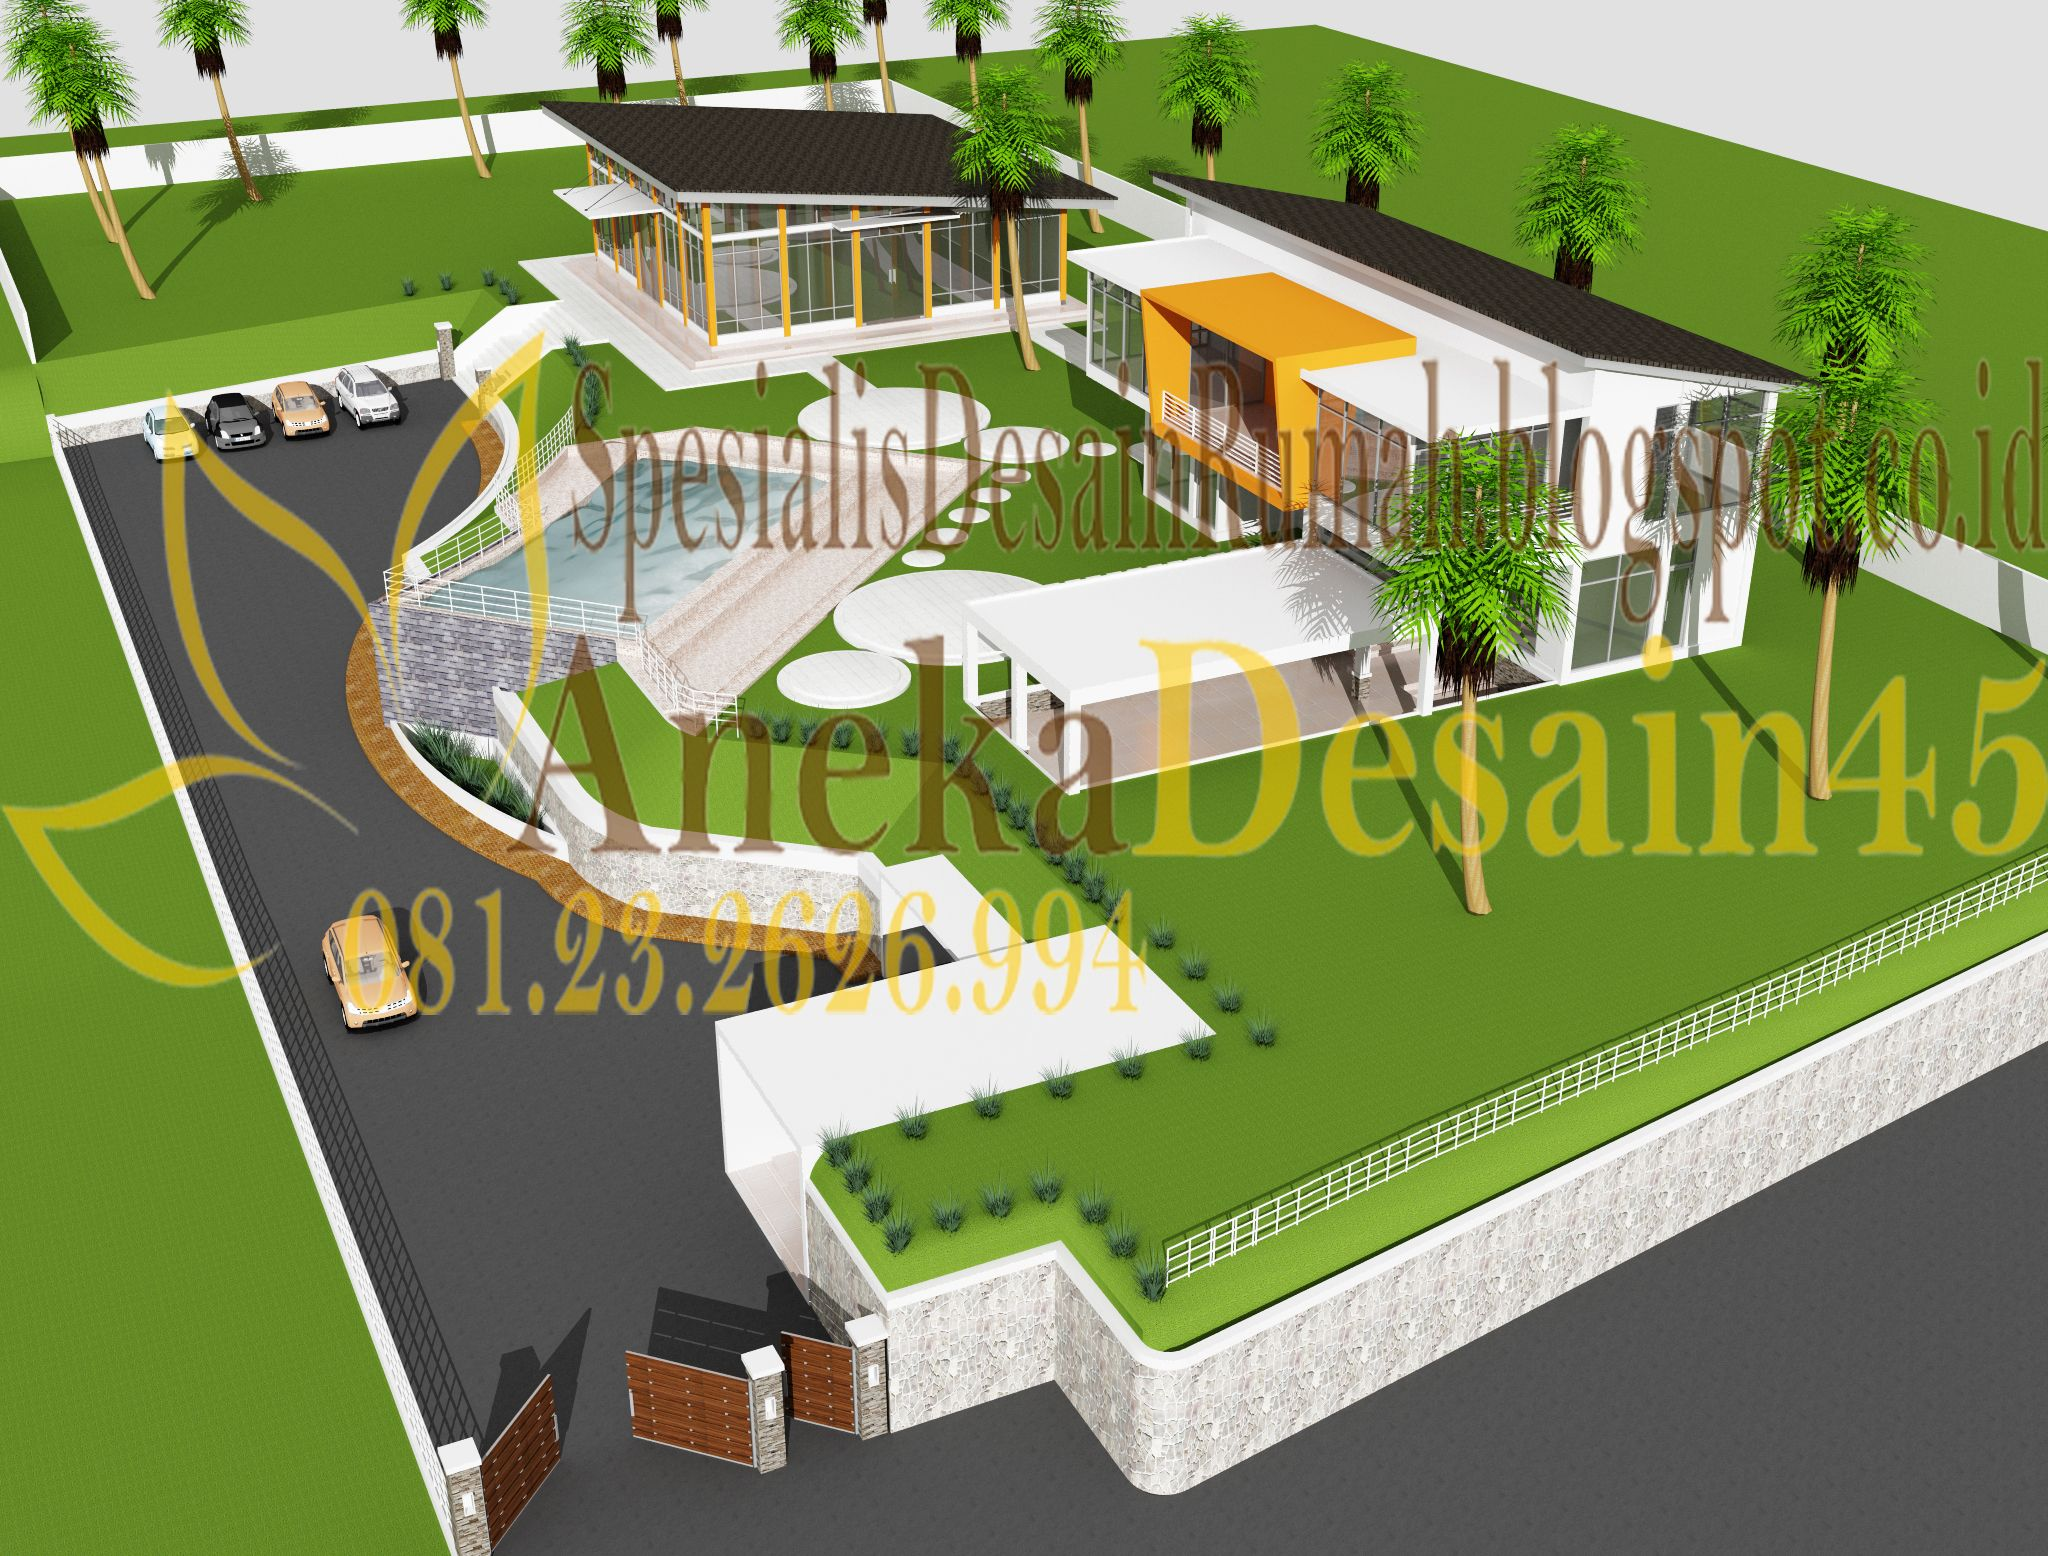 Desain Interior Rumah Desain Rumah Interior Desain Gambar Desain Rumah Desain Rumah & Desain Interior Rumah Desain Rumah Interior Desain Gambar Desain ...